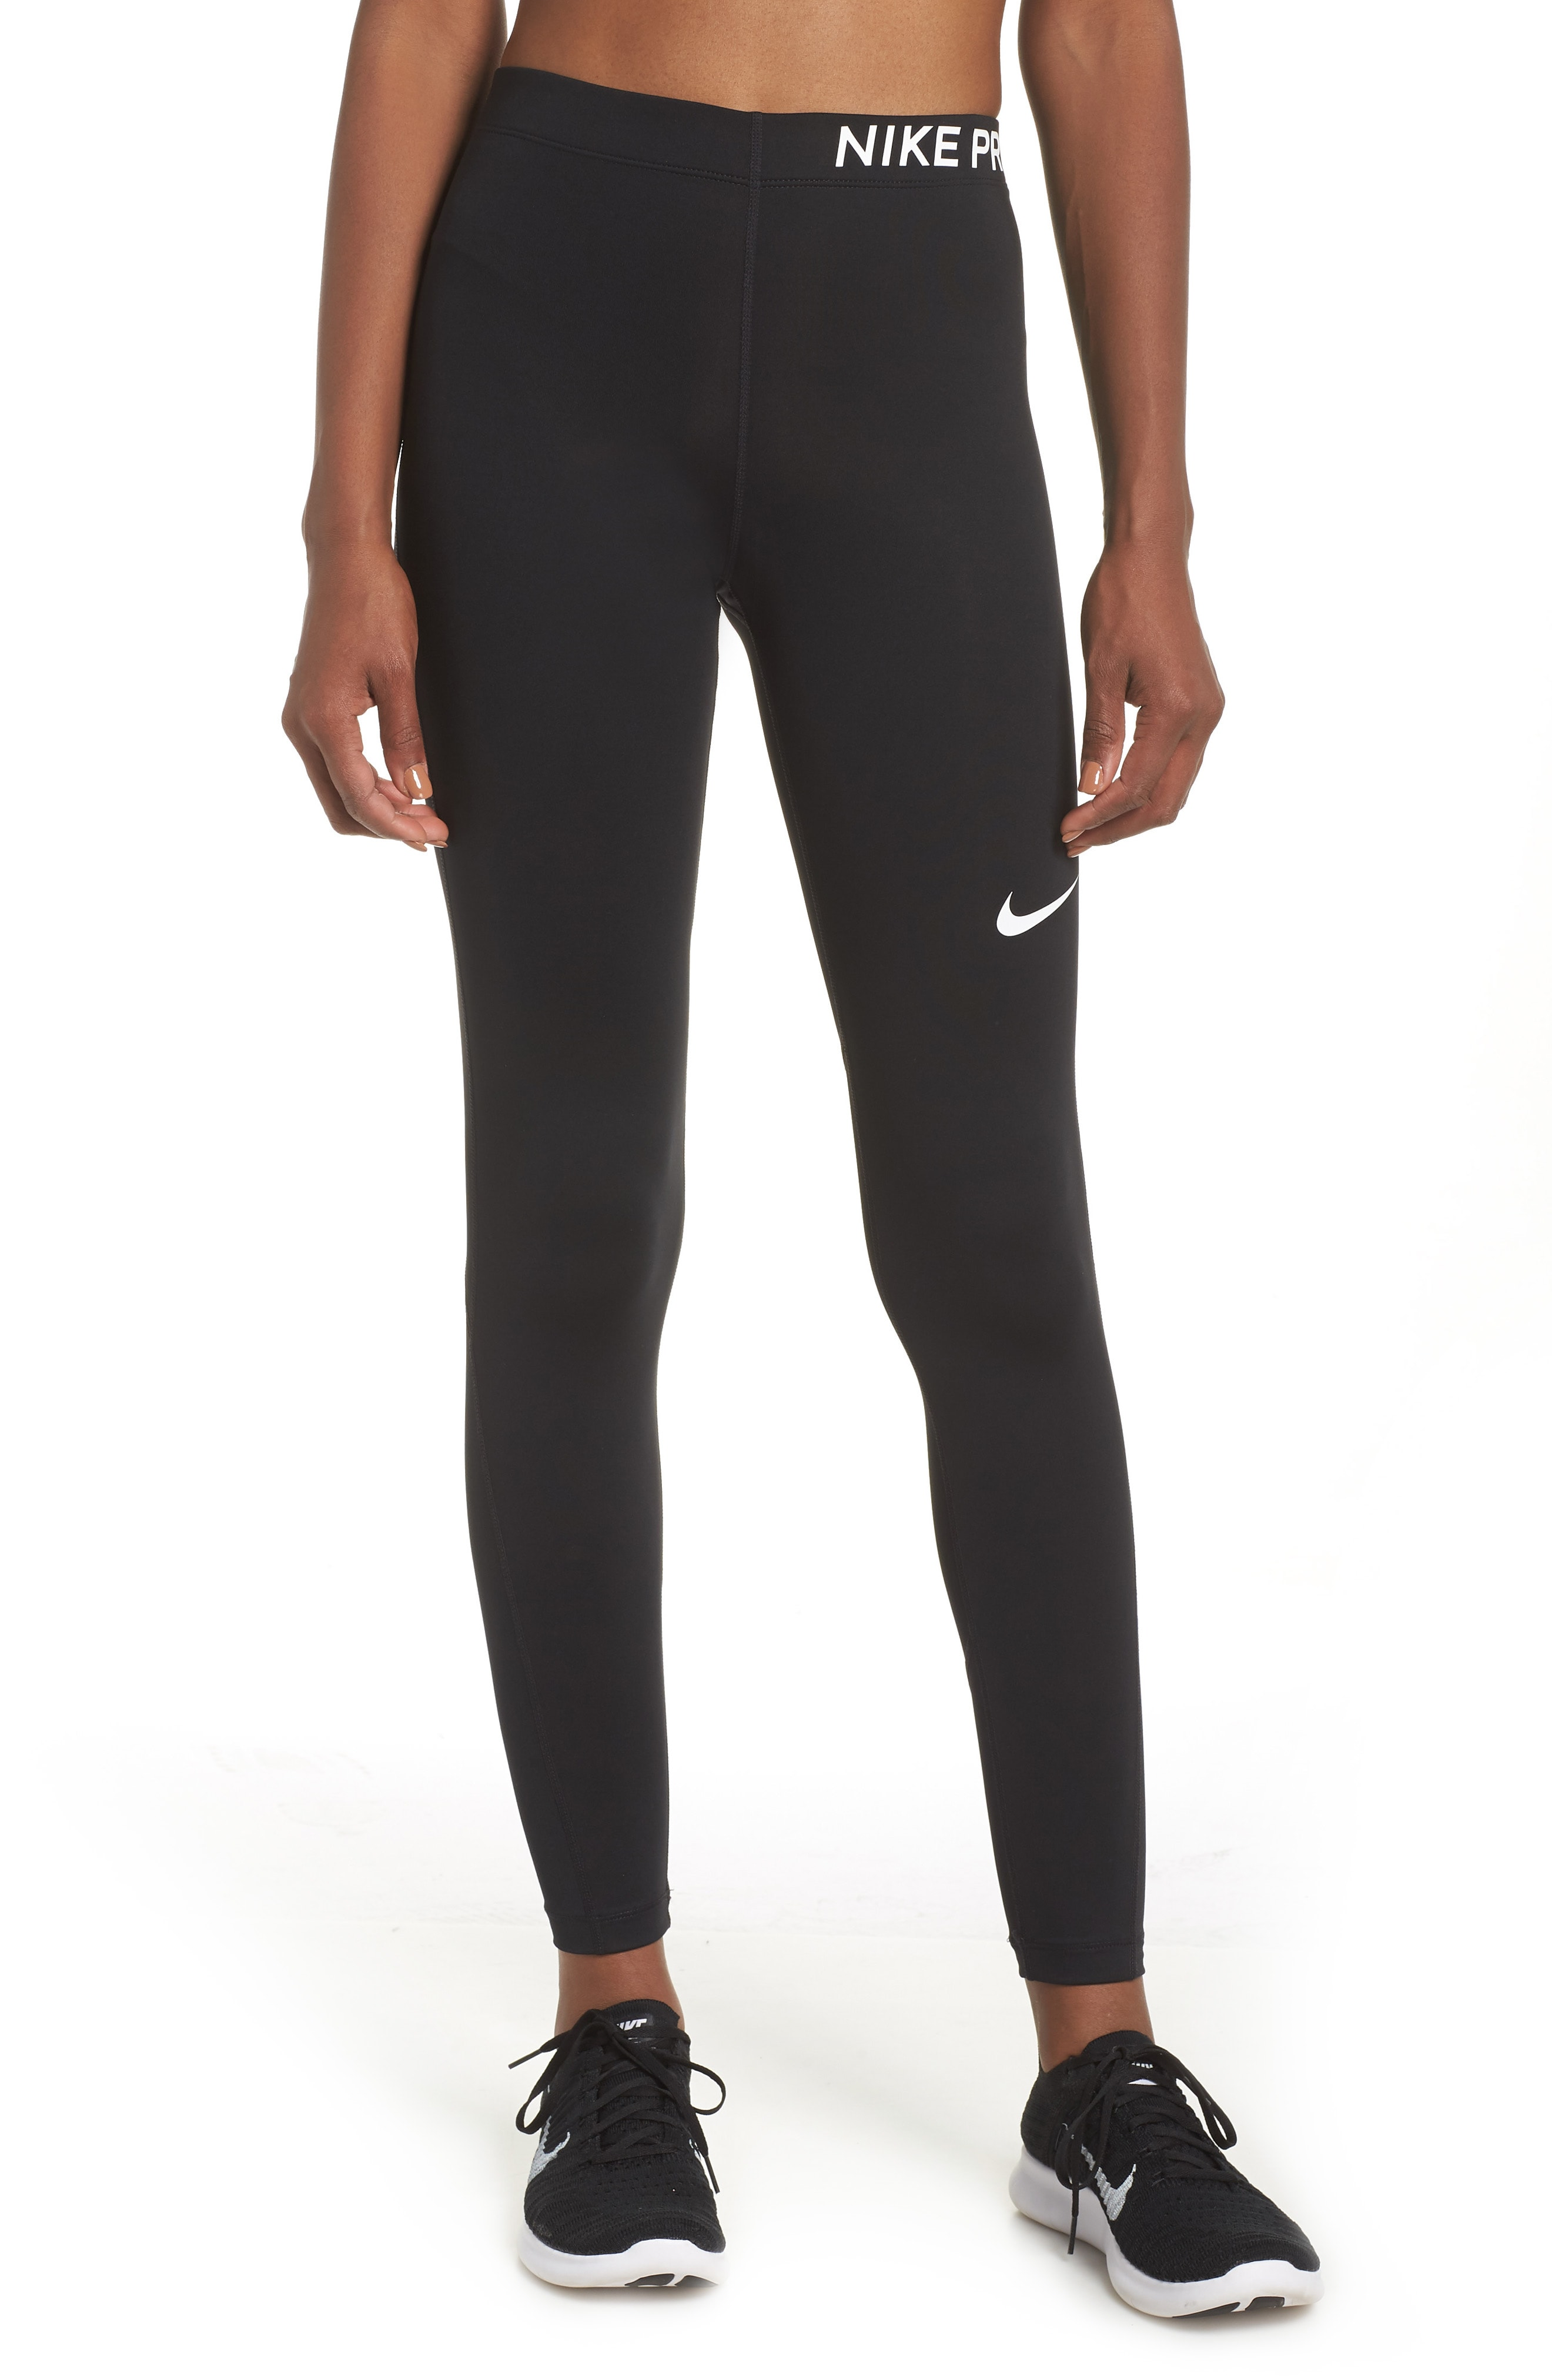 Nike Pro Mid Rise Training Tights